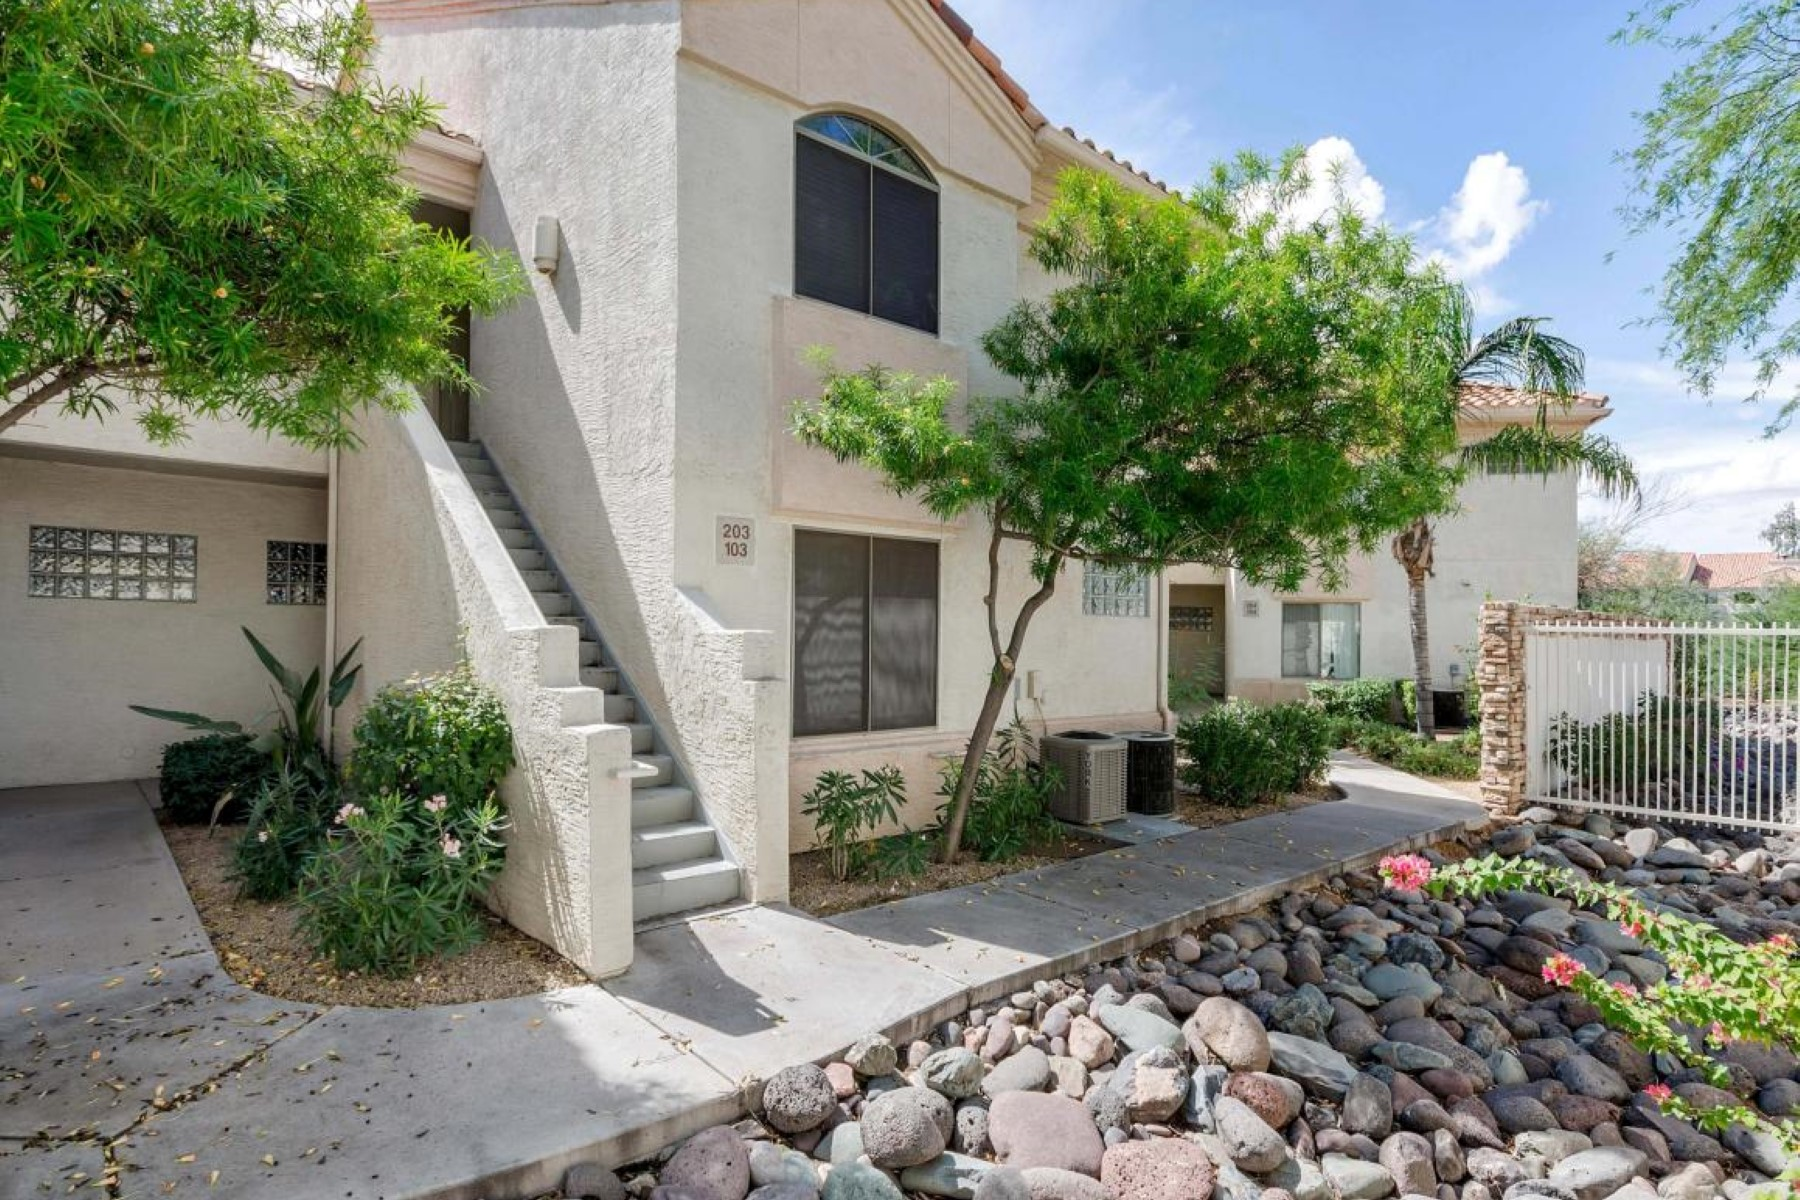 联栋屋 为 销售 在 Beautifully maintained and perfectly located Townhouse 5249 E Shea BLVD 103 Scottsdale, 亚利桑那州 85254 美国